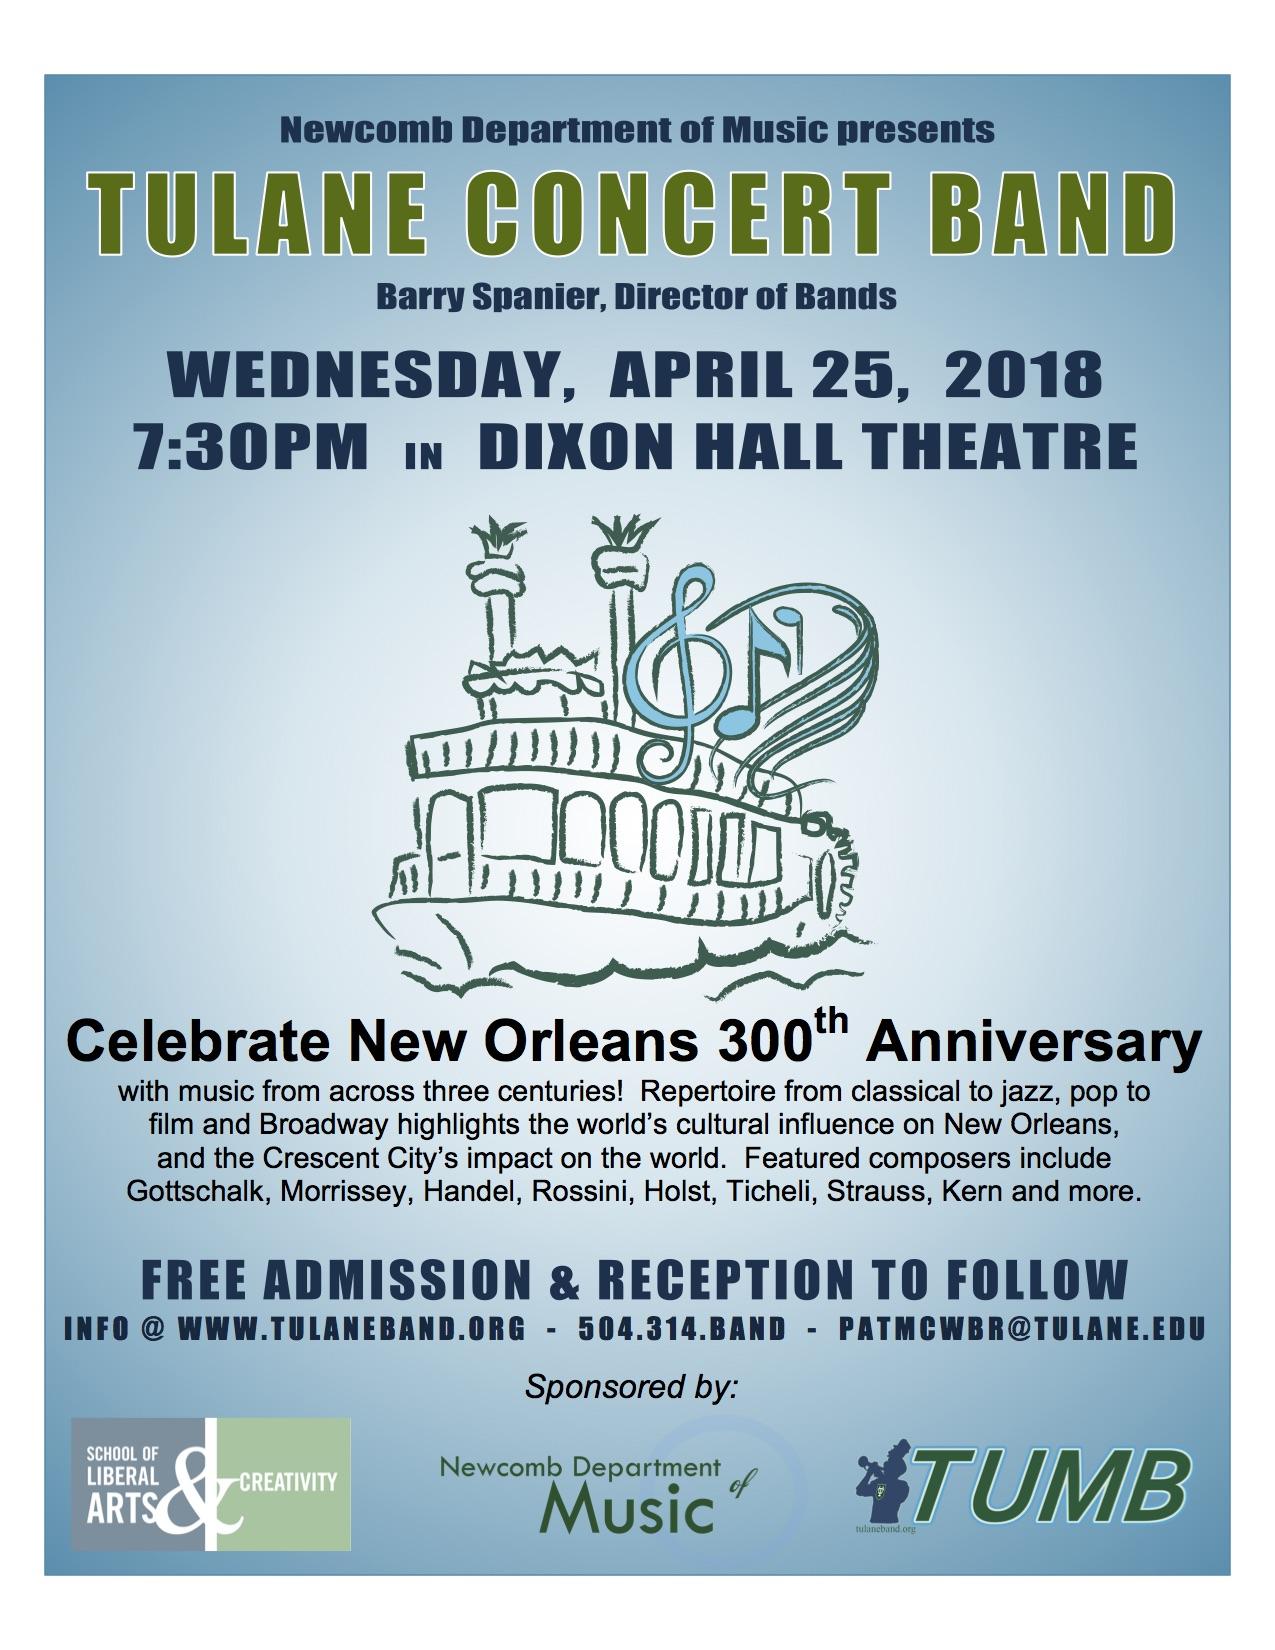 TCB spring concert 2018 poster.jpg